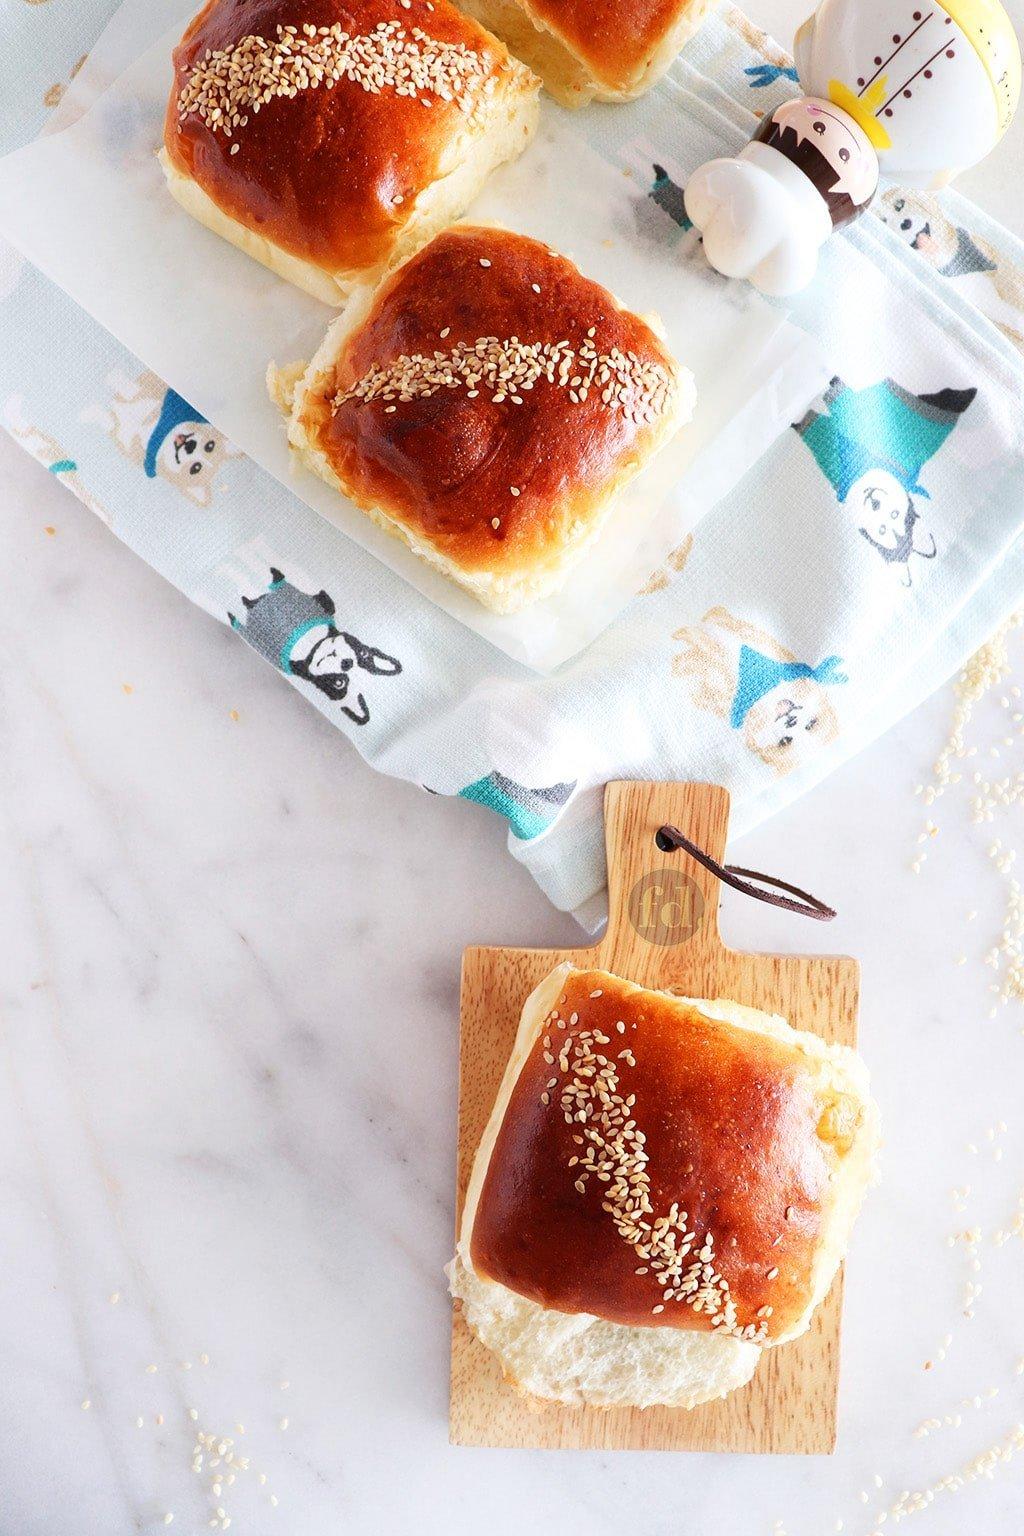 Soft & Moist Bakery-Style Butter Coconut Buns